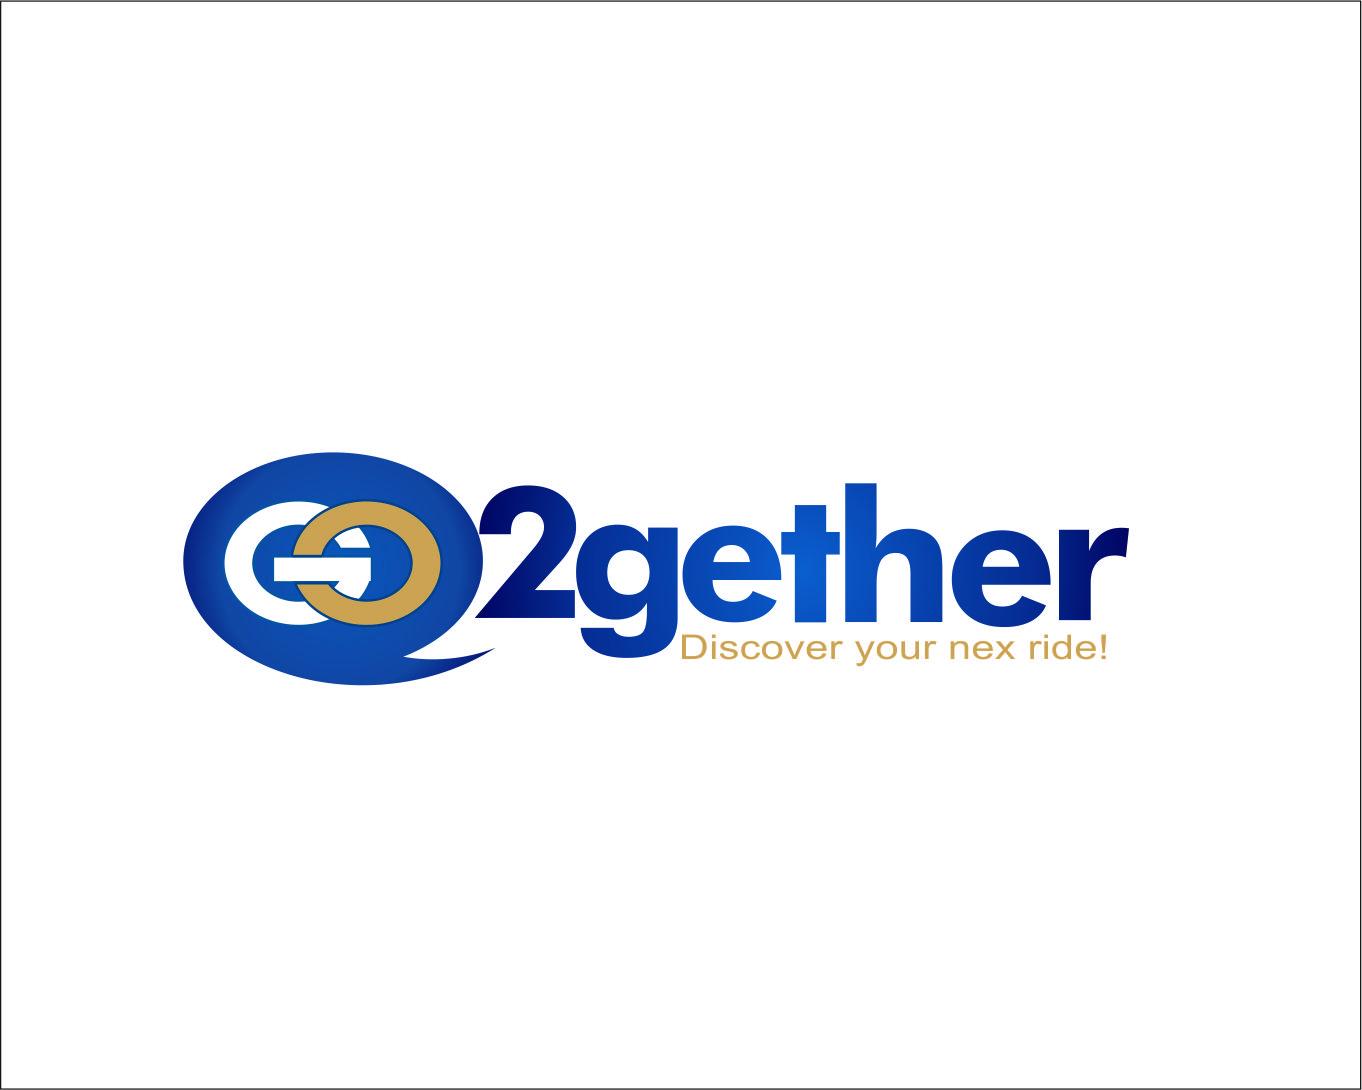 Logo Design by Agus Martoyo - Entry No. 114 in the Logo Design Contest Captivating Logo Design for GO2GETHER.